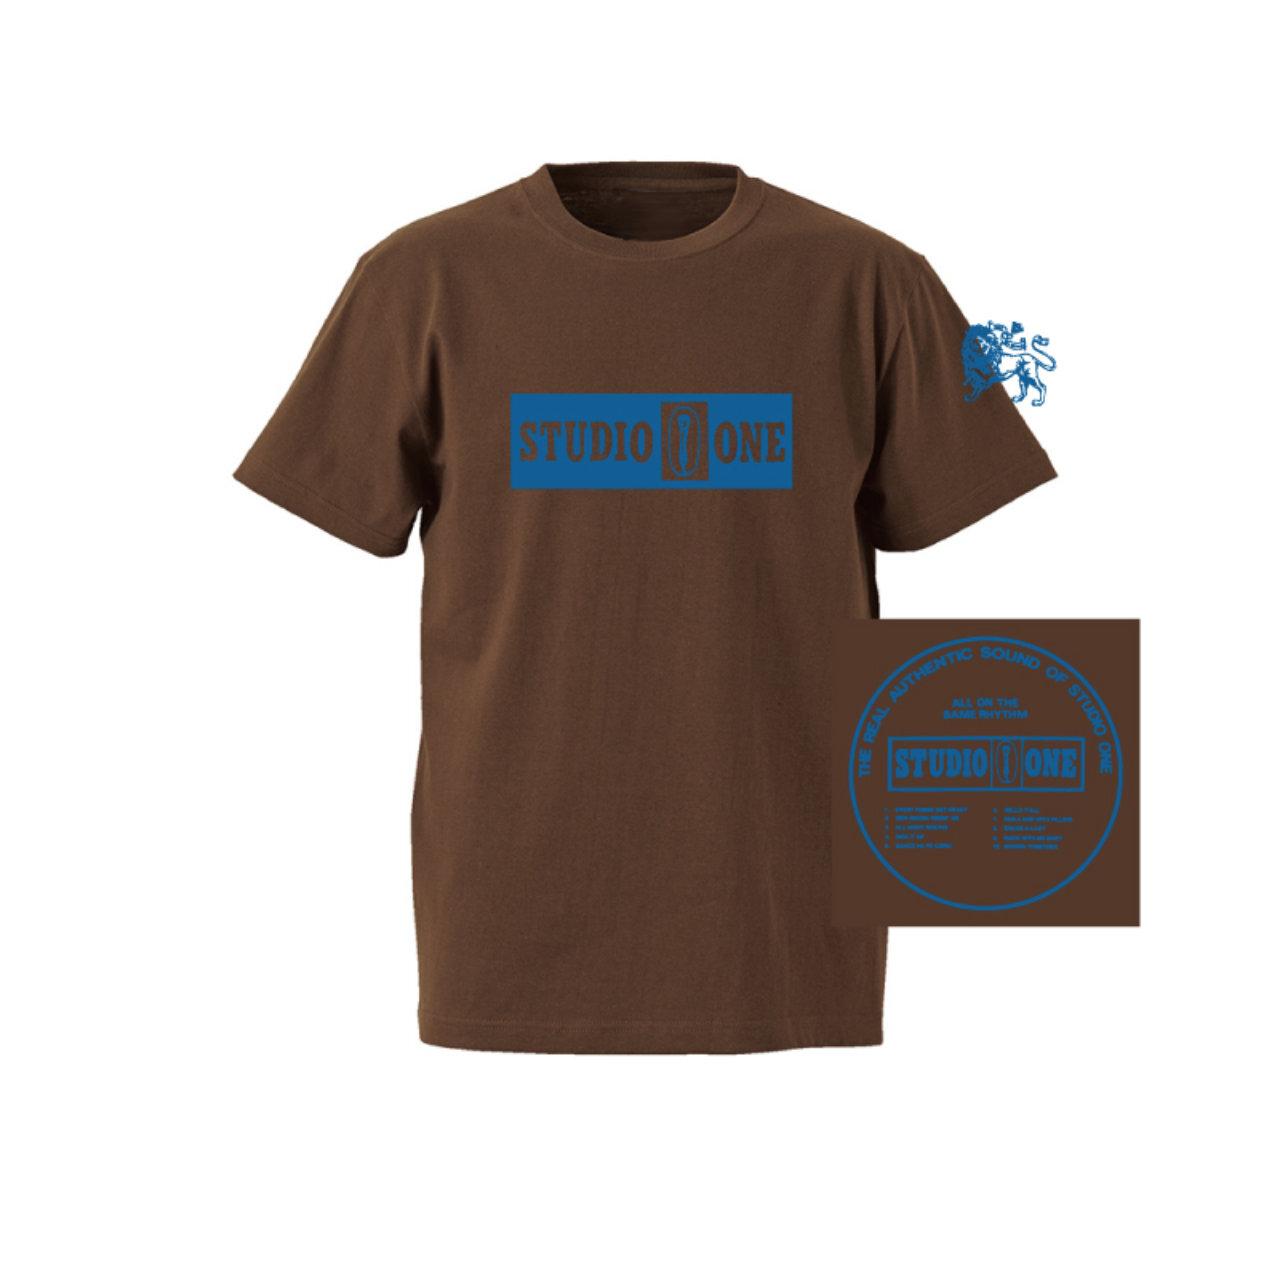 【Or Glory】 STUDIO ONE ジャマイカ SKA Tシャツ 〈Brown〉